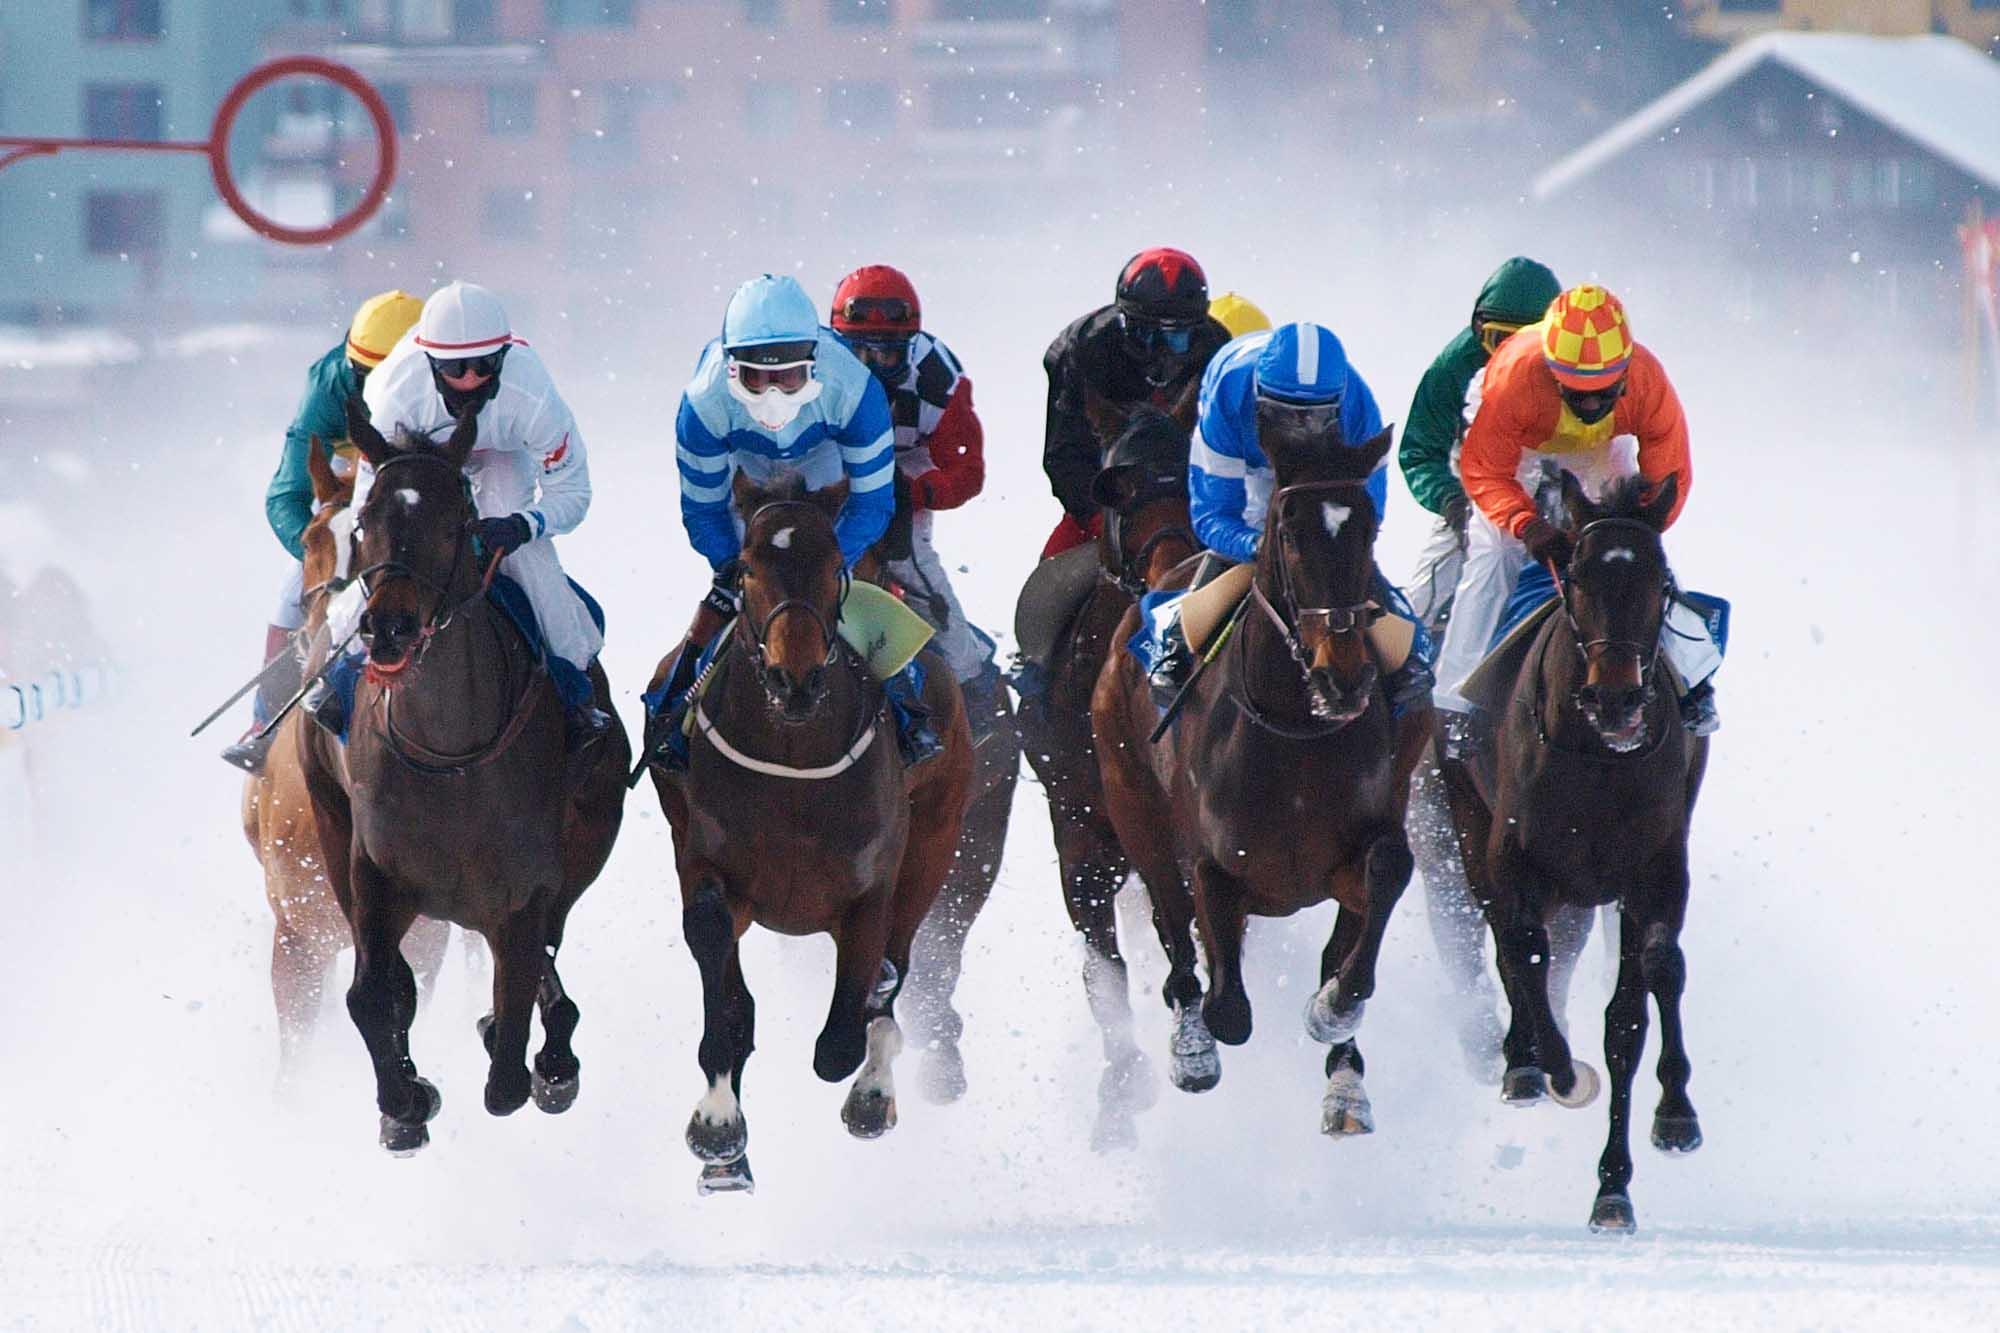 sportfotografie,white turf,st.moritz,pferdesport,eventfotografie,veranstaltungsfotografie,pferderennen,rennsport